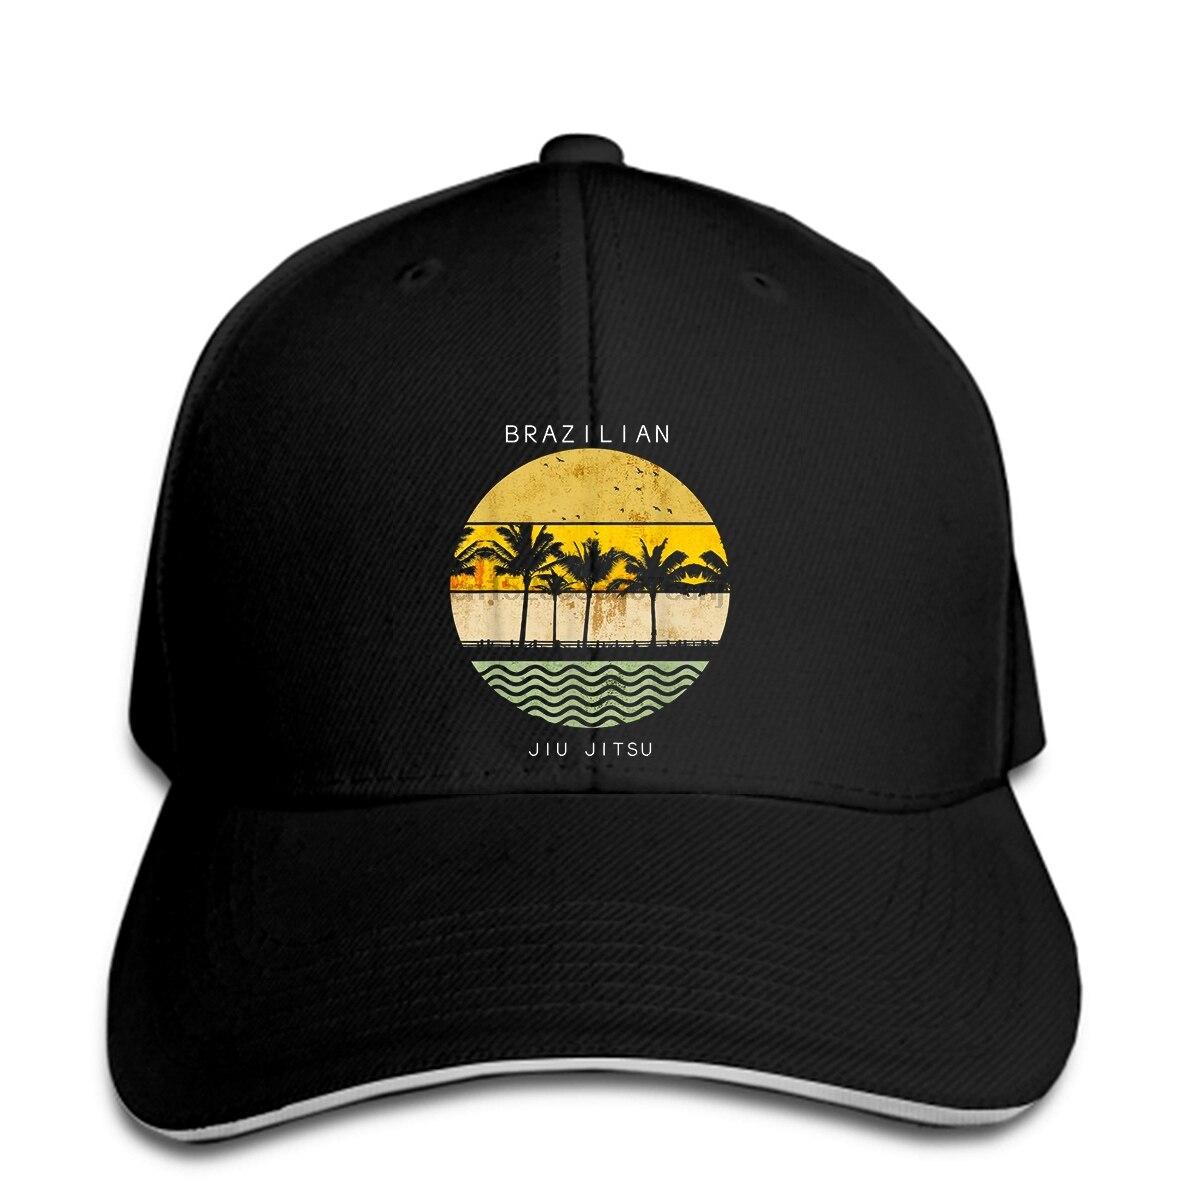 Baseball Cap Hot Sale Fashion Brazilian Jiu Jitsu Hat For Men BJJ Tropical Snapback Hat